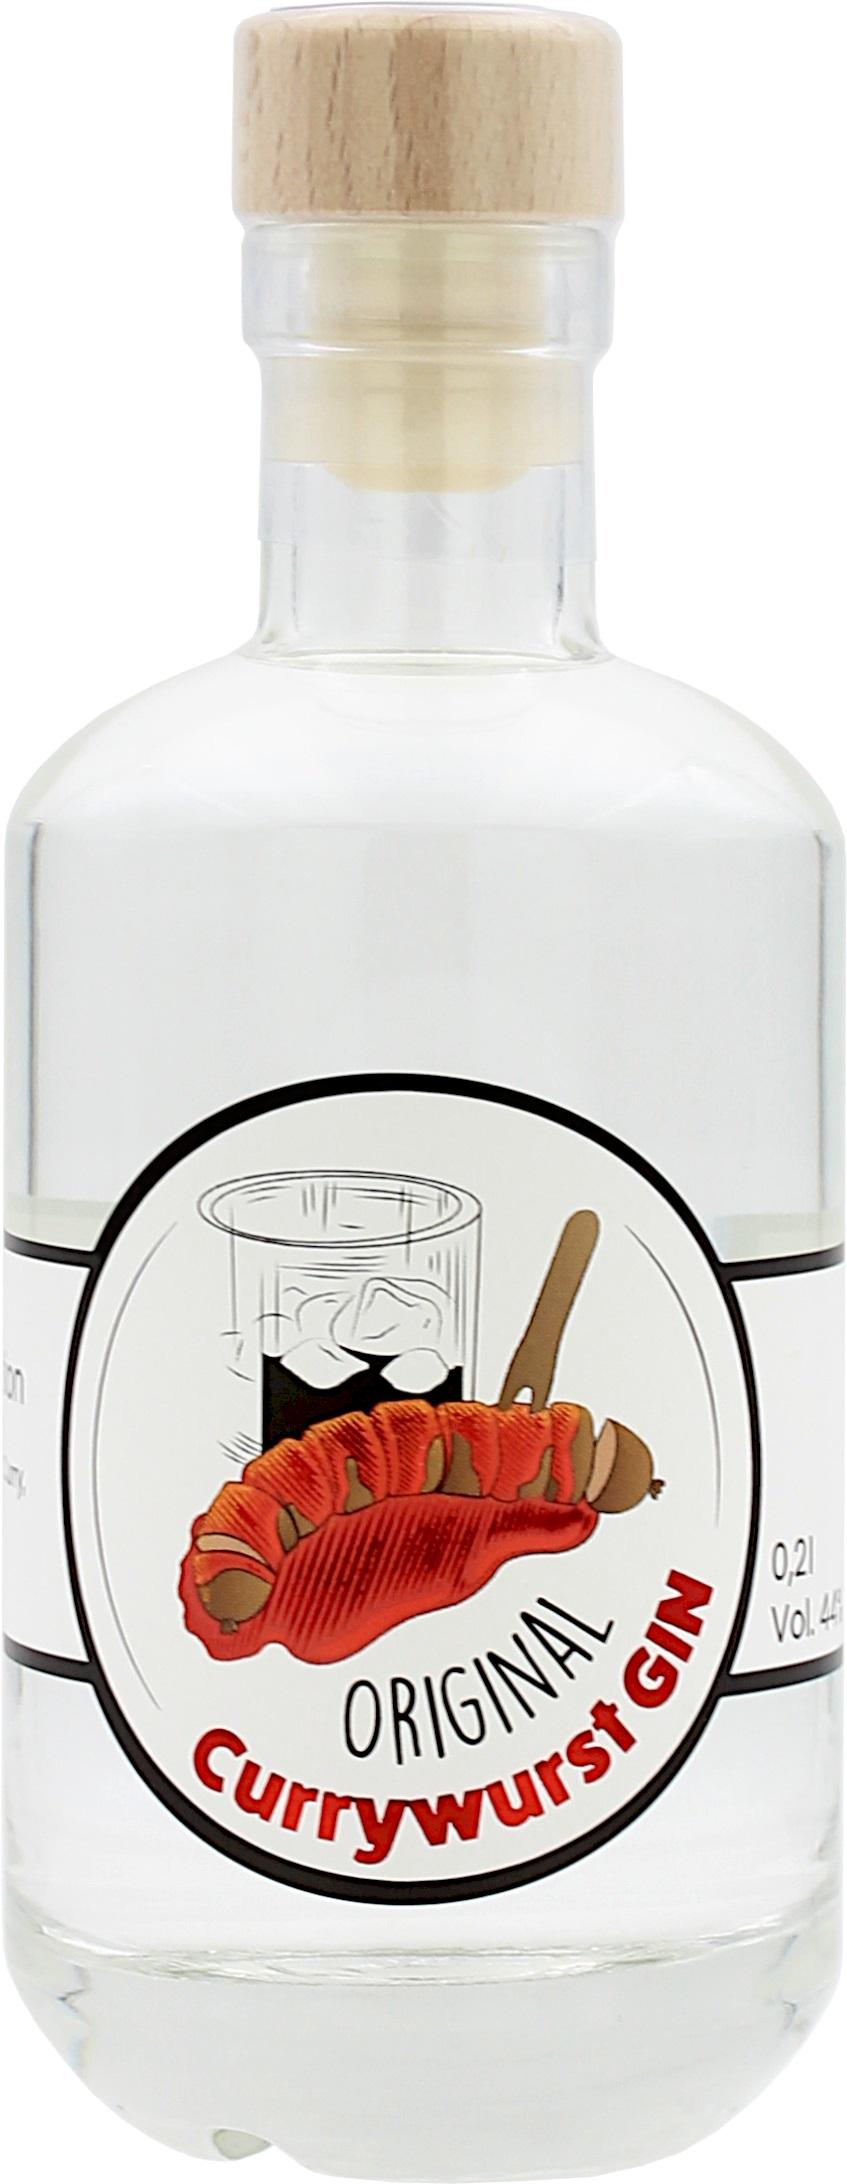 Currywurst Gin 41.0% 0,2l